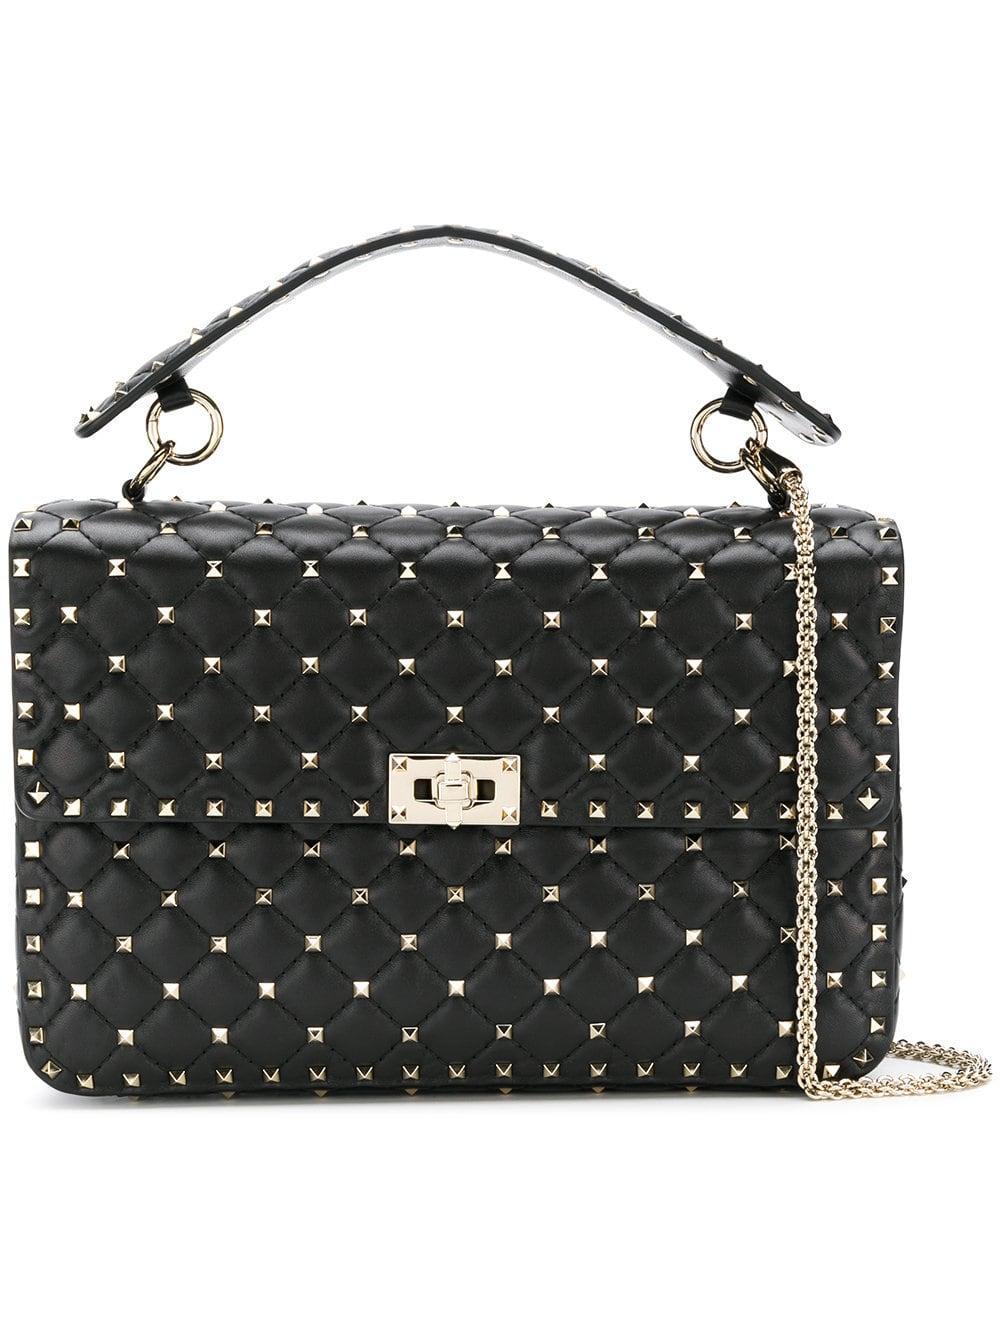 70767f48aa15 Lyst - Valentino Rockstud Spike Large Leather Shoulder Bag in Black ...